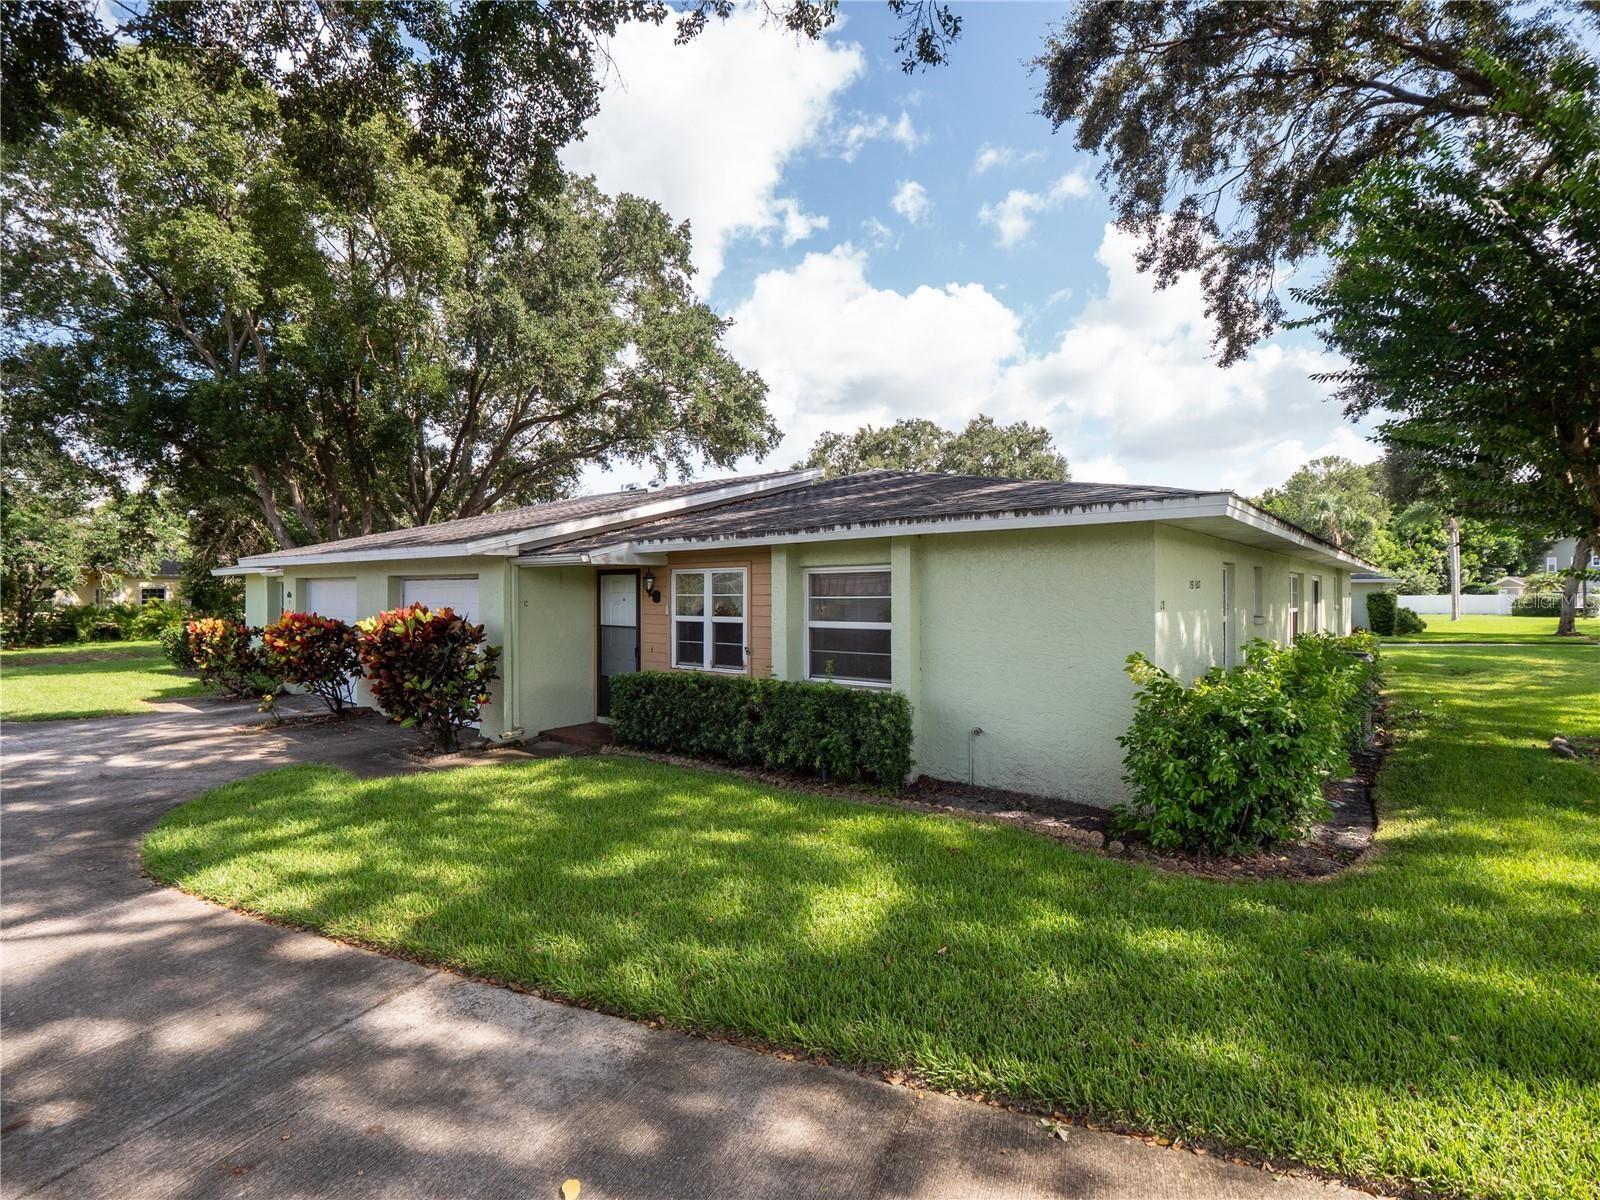 1150 ORANGE TREE CIRCLE E #C, Palm Harbor, FL 34684 - #: U8136494